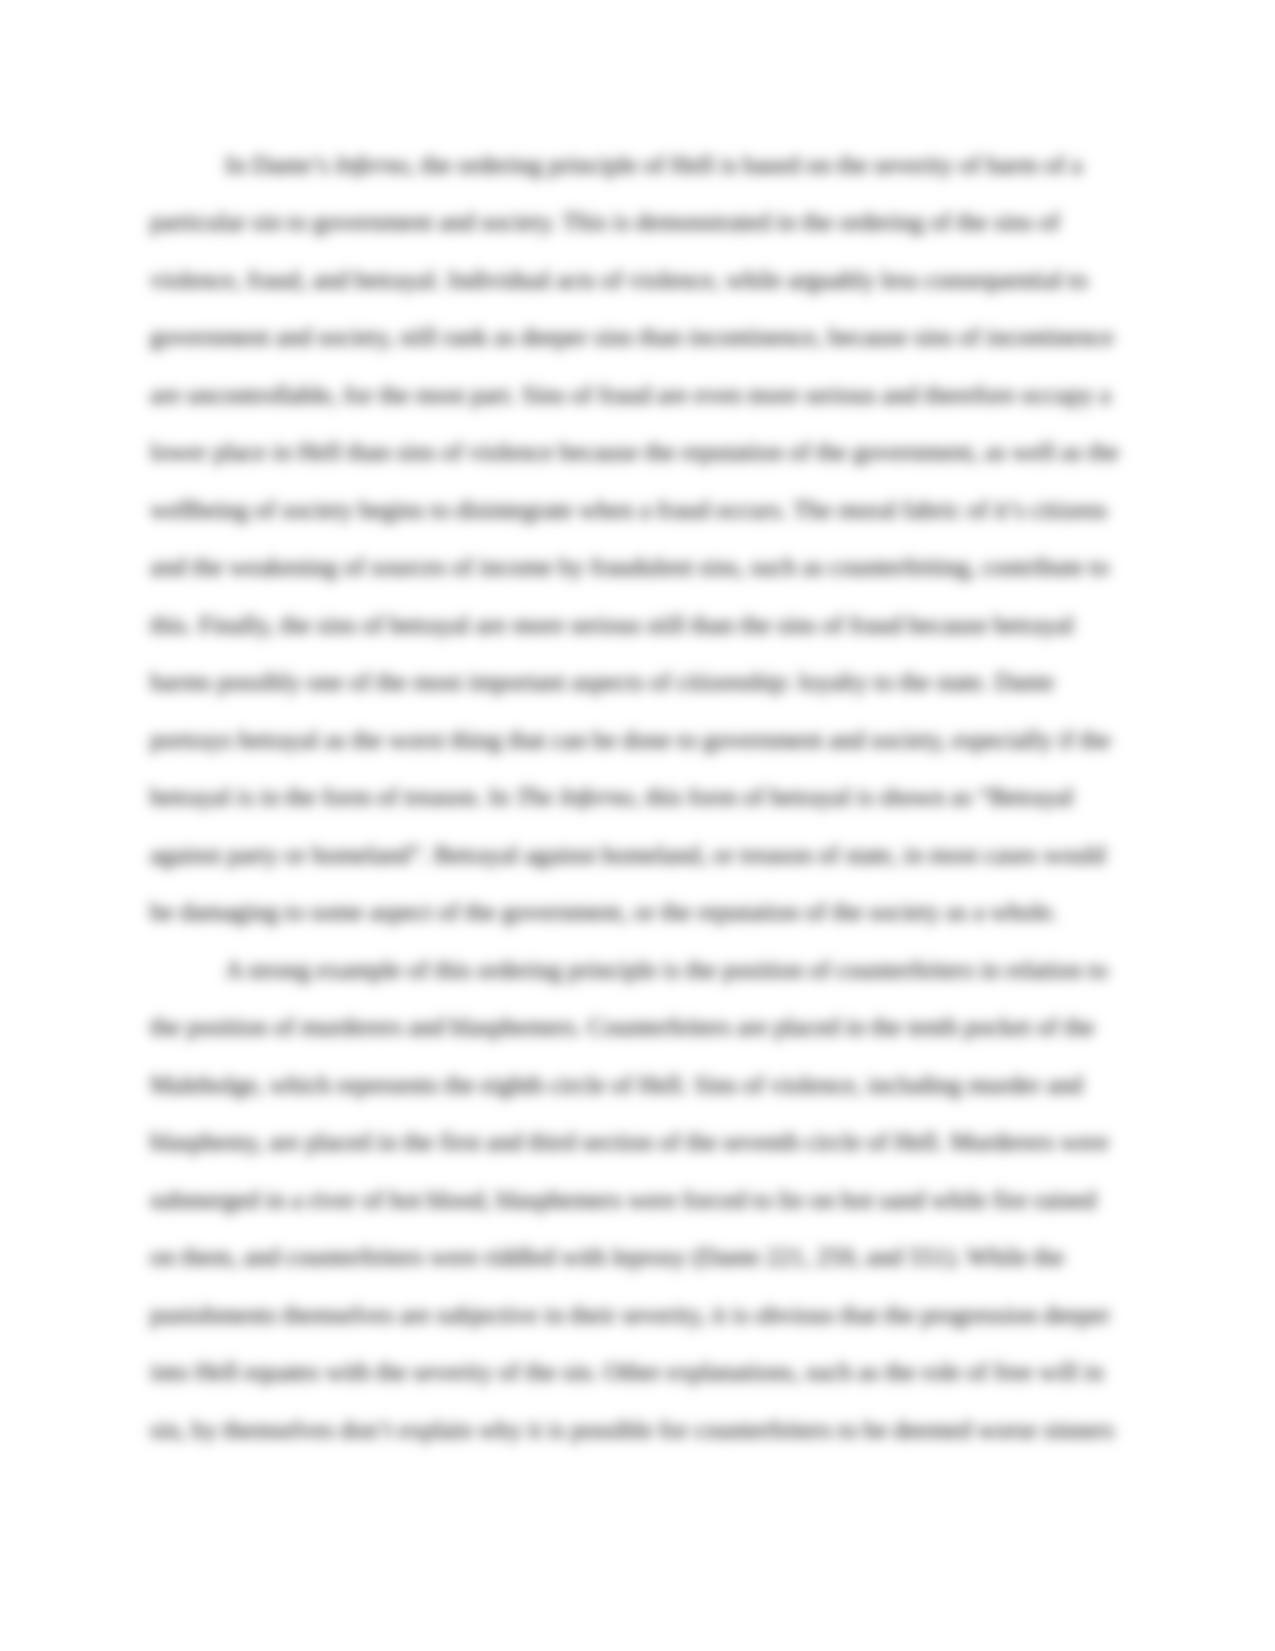 A literary analysis of inferno by dante alighieri